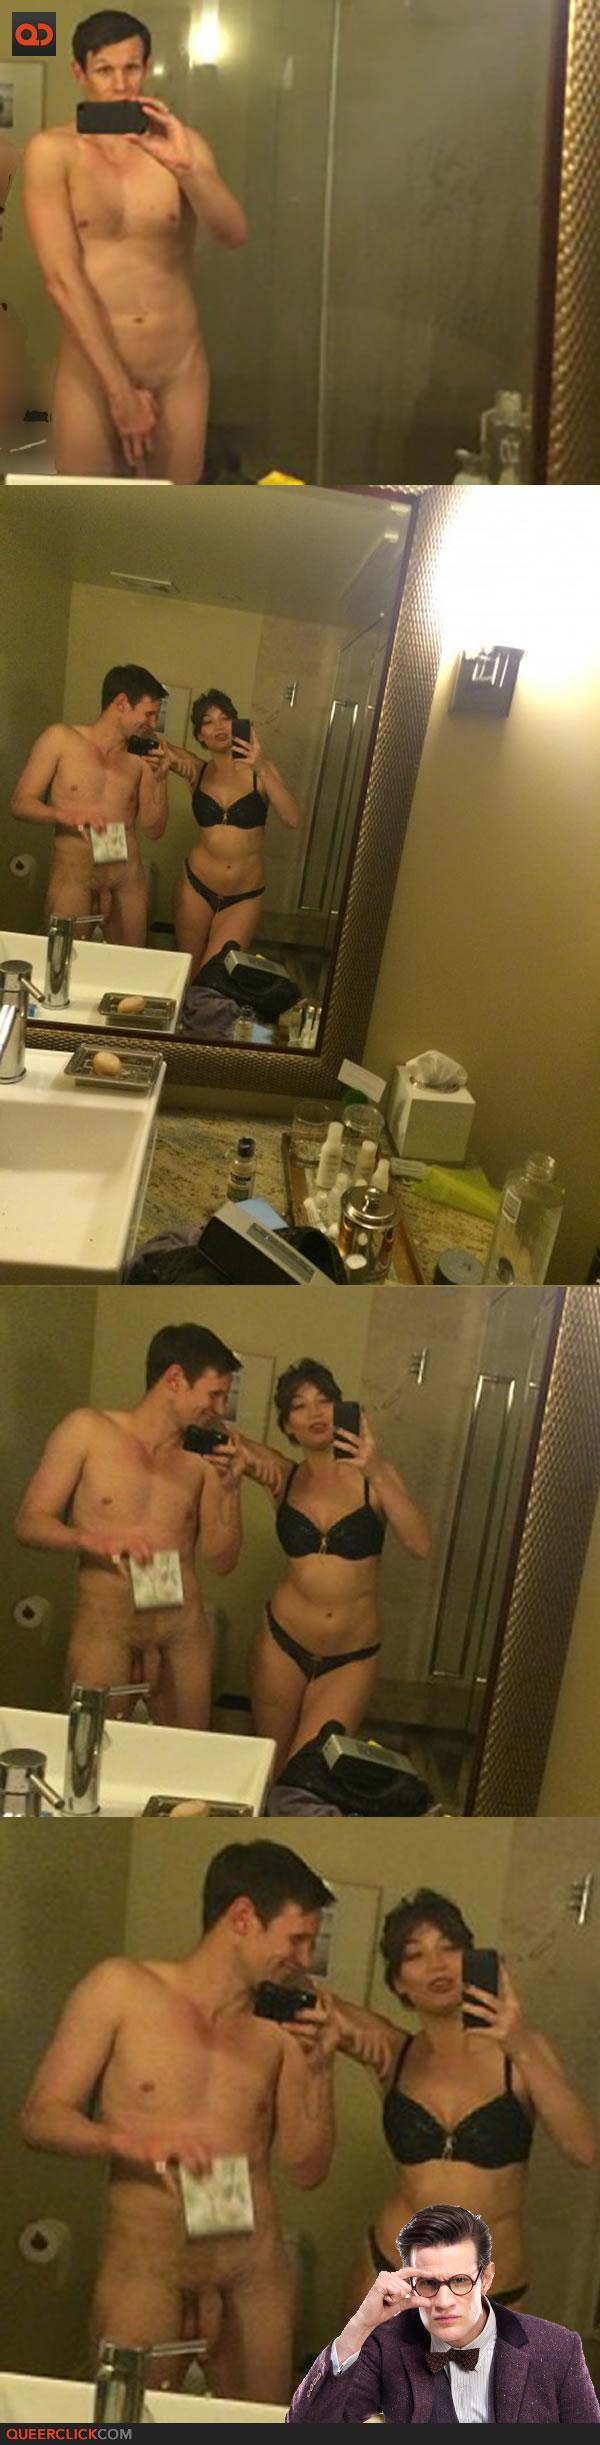 Kristin davis naked nude (84 pictures)